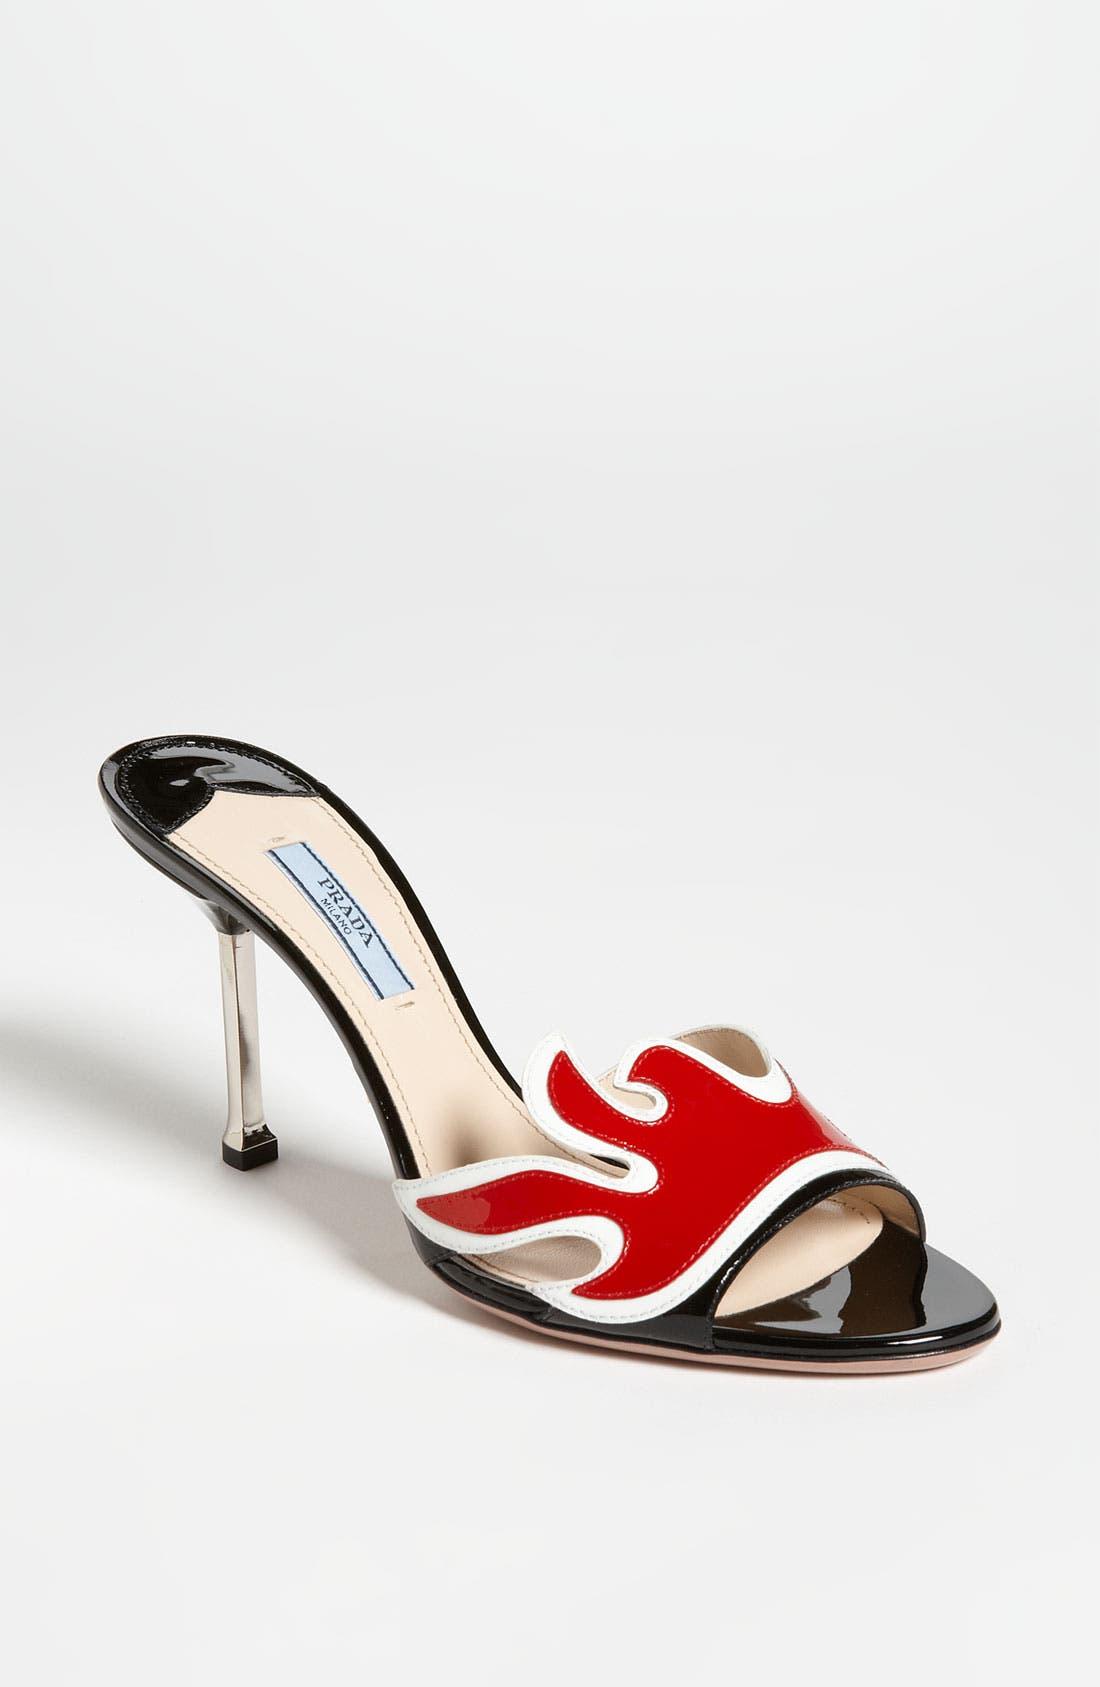 Main Image - Prada Flame Slide Sandal